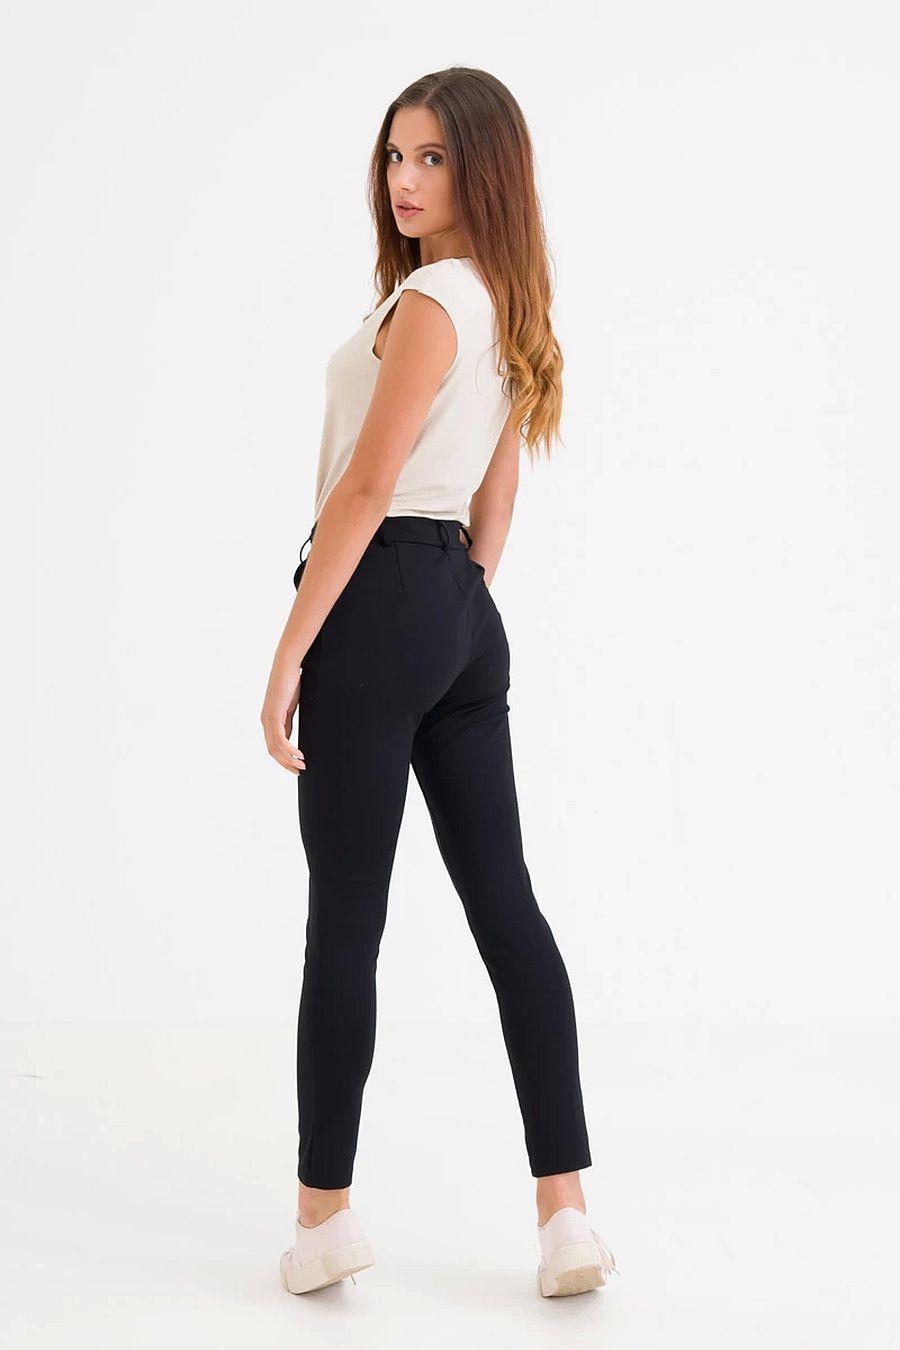 Reclaim The Perfect Pants